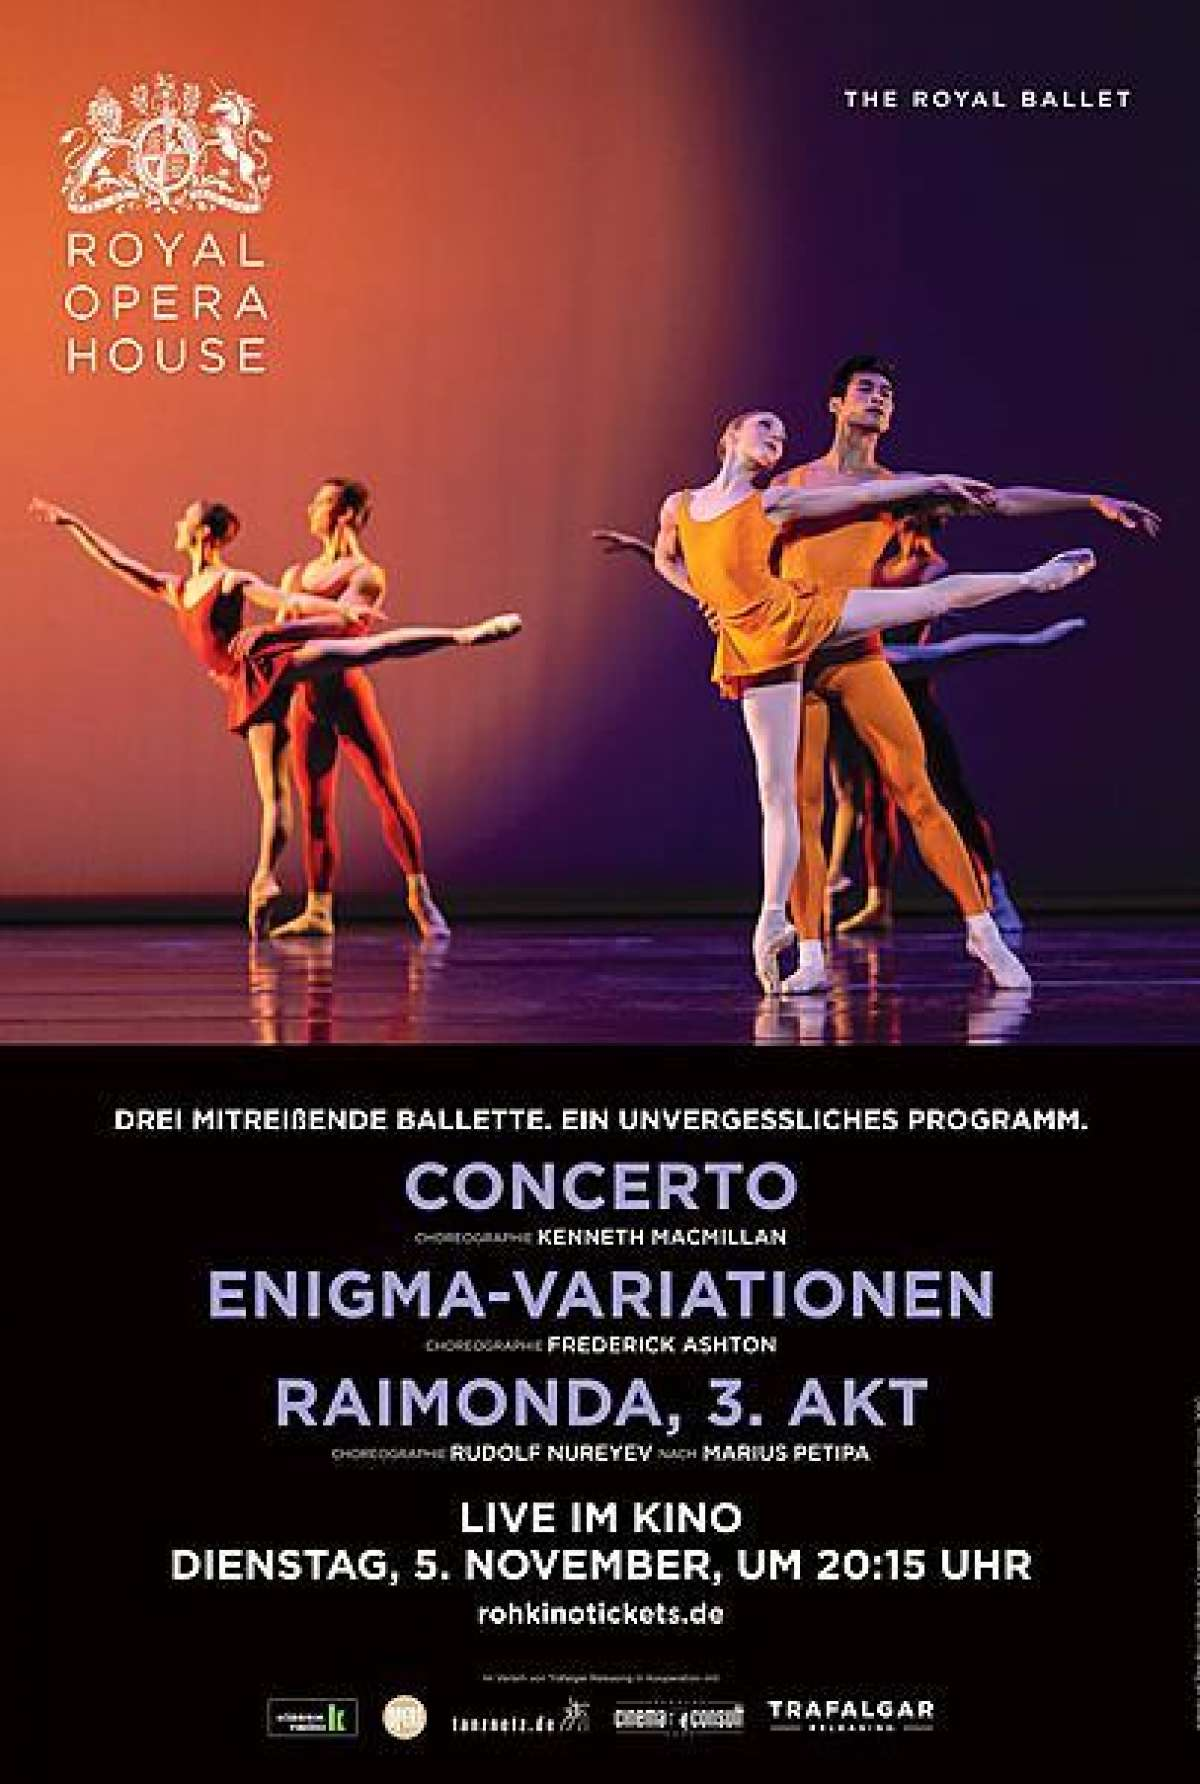 Concerto/Enigma-Variationen/Raimonda 3.Akt - Royal Opera House - Cine-Royal  - Fritzlar